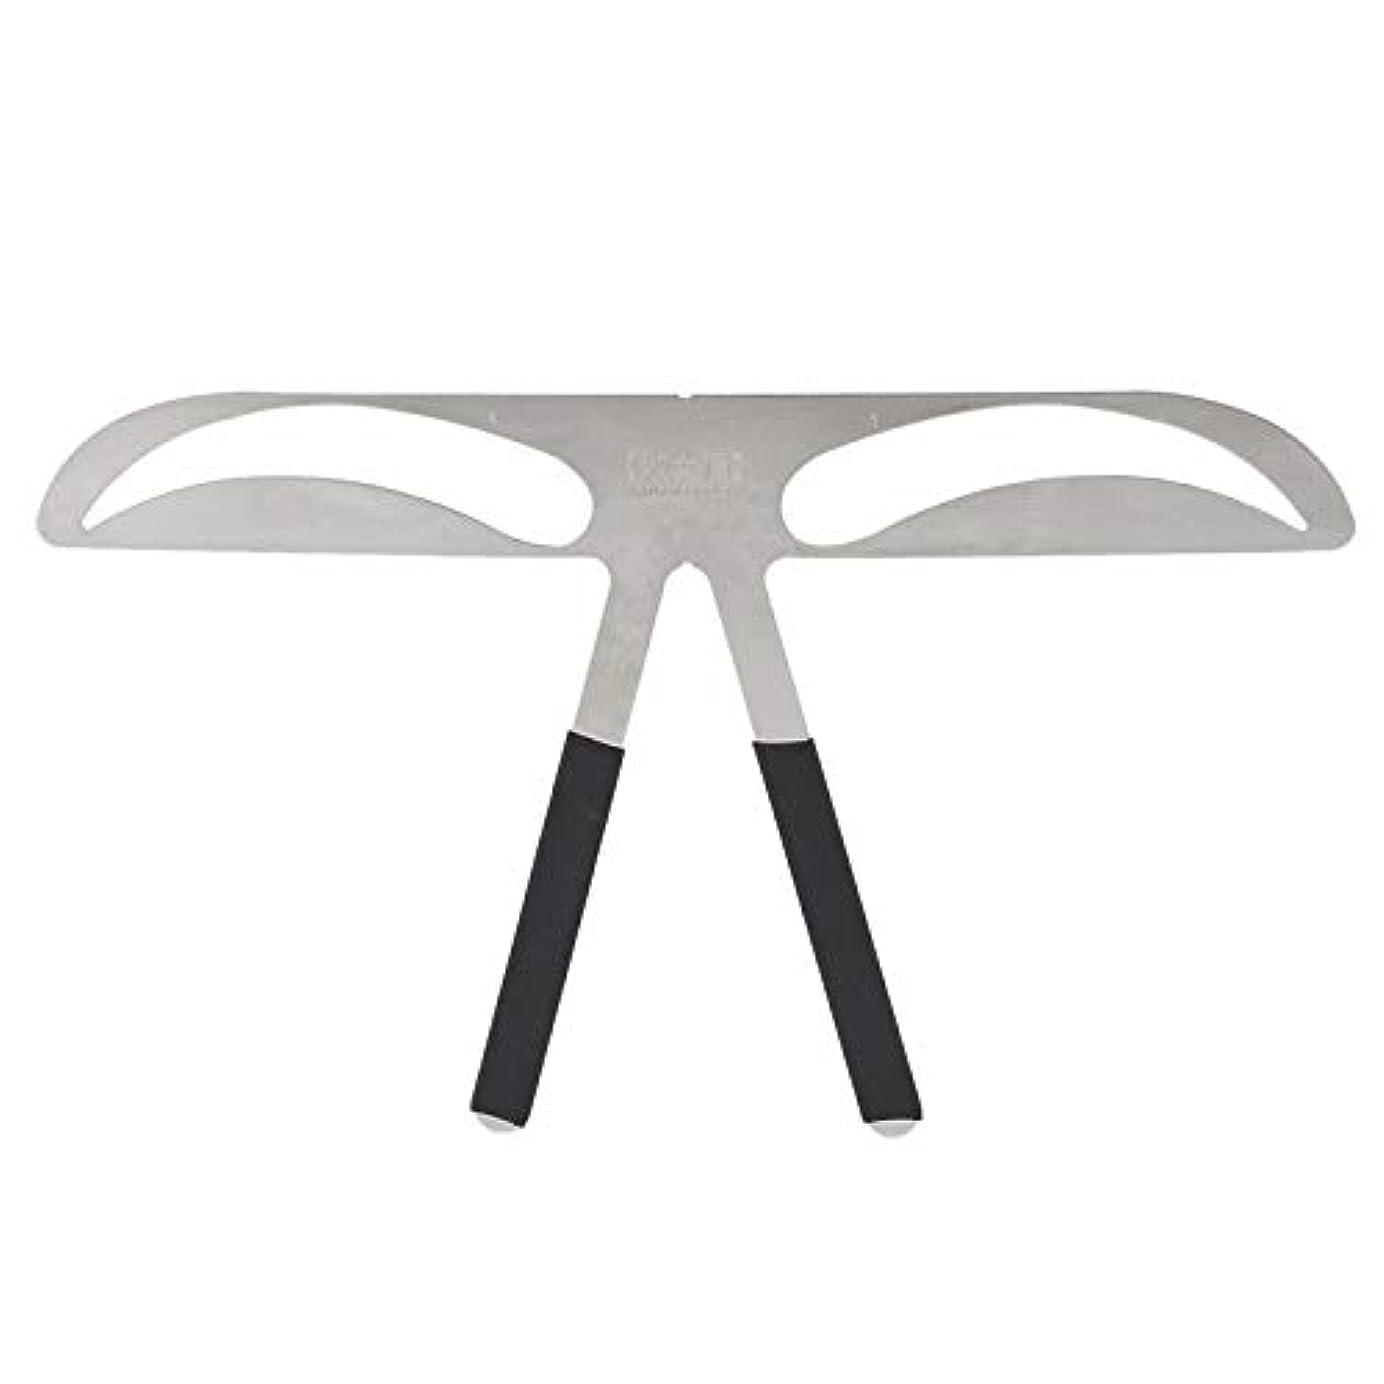 TOOGOO 眉のステンシルルーラー、眉のエンハンサー、恒久的な入れ墨の眉のツール #A